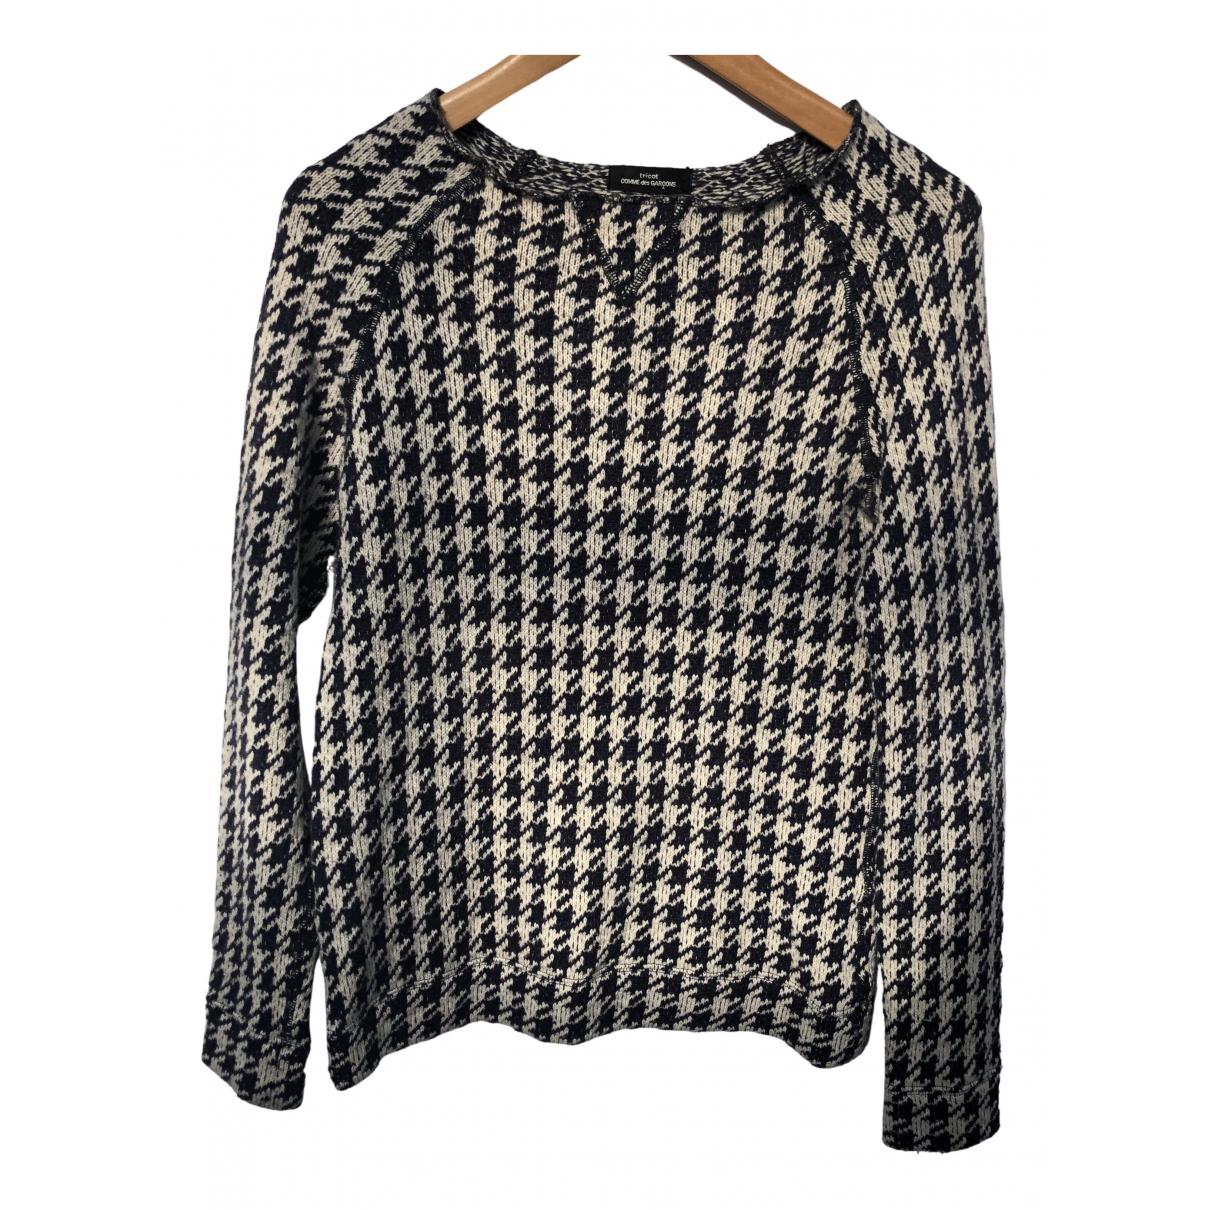 Comme Des Garcons \N Navy Wool Knitwear for Women M International